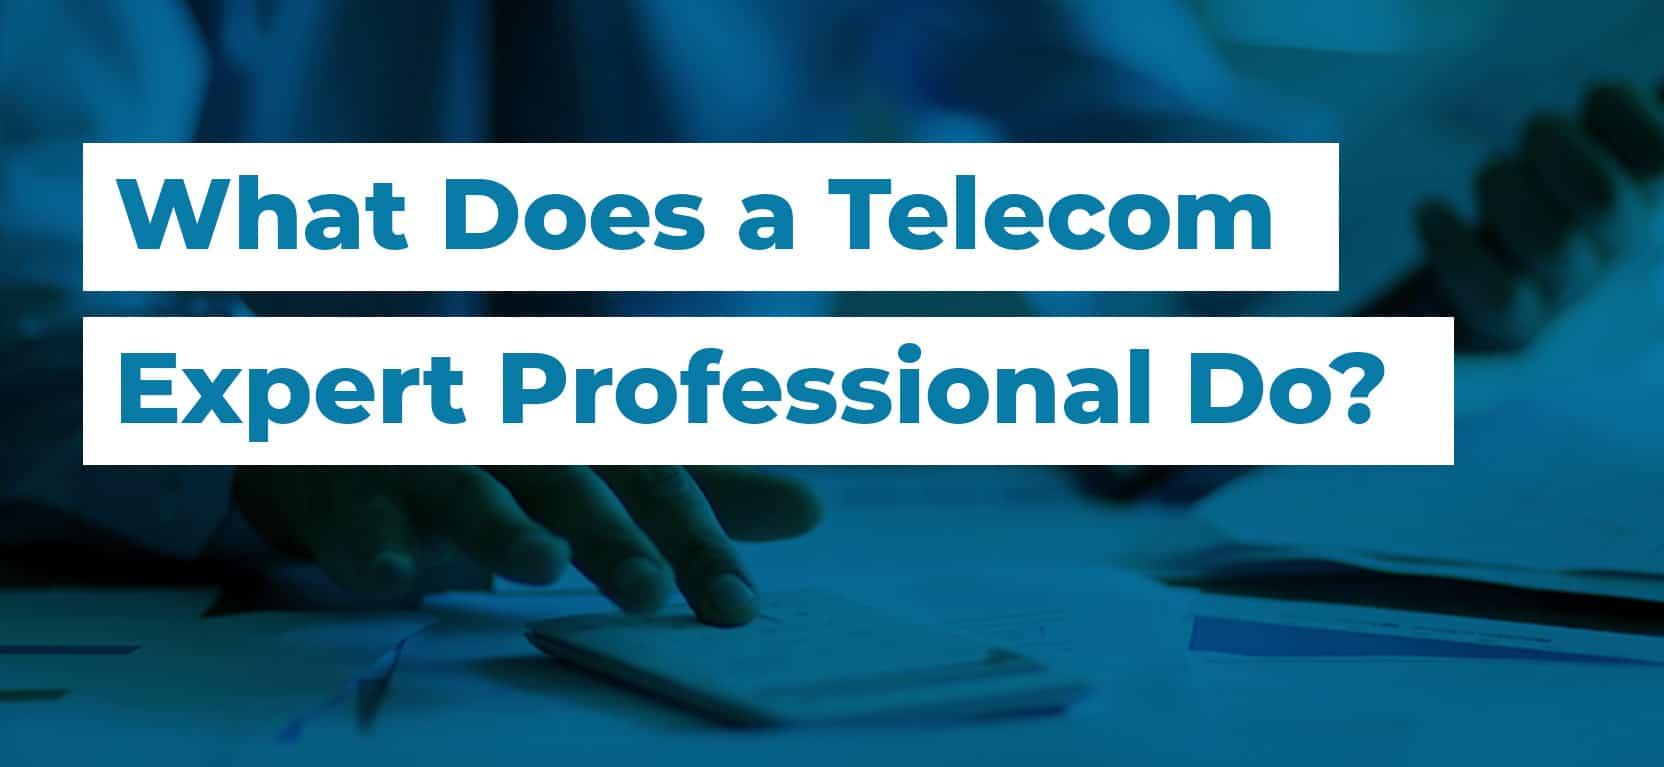 60 What Does a Telecom Expert Professional Do3